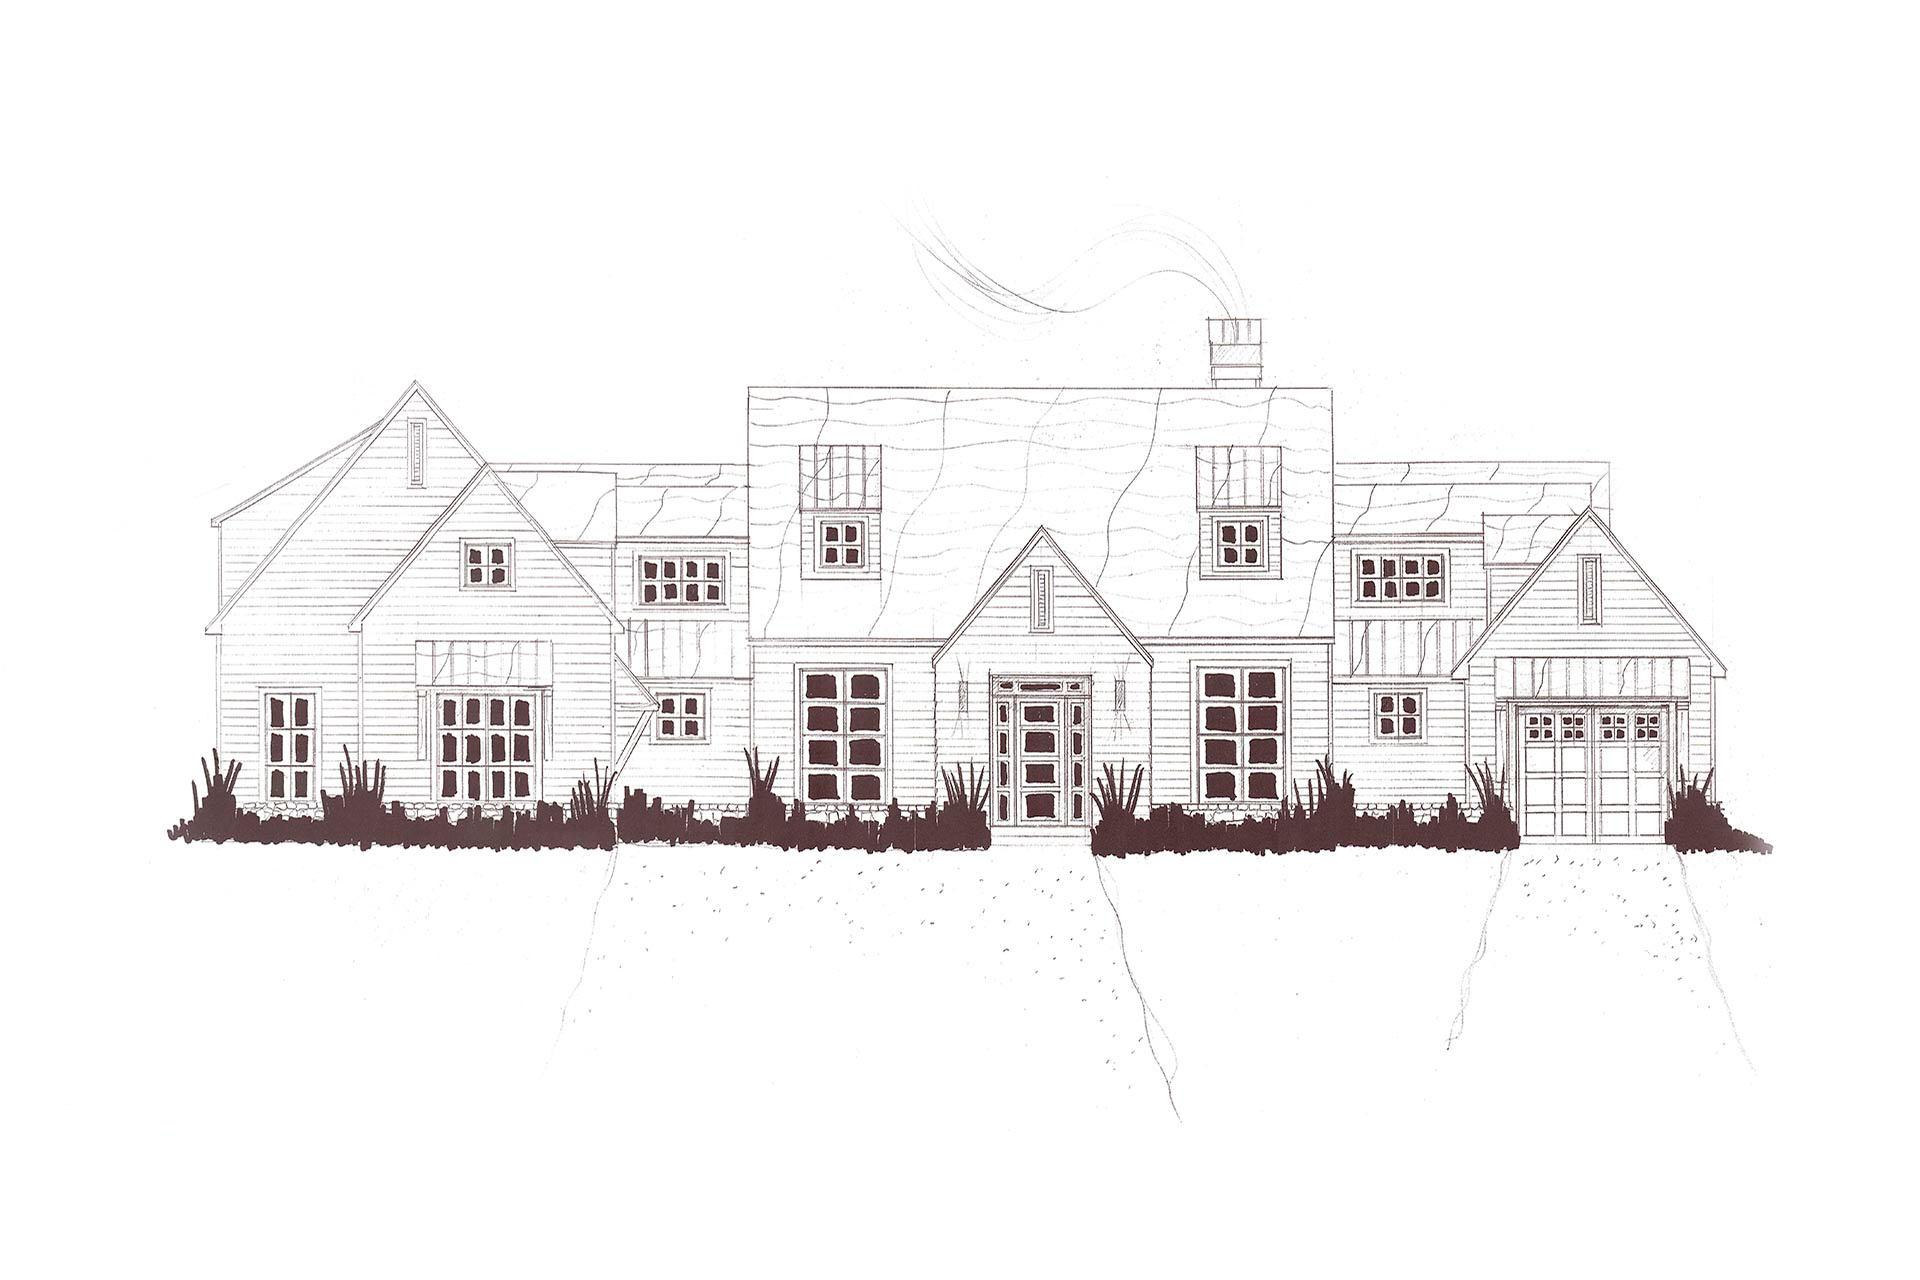 Modern farmhouse 3 bainbridge design group for Bainbridge design